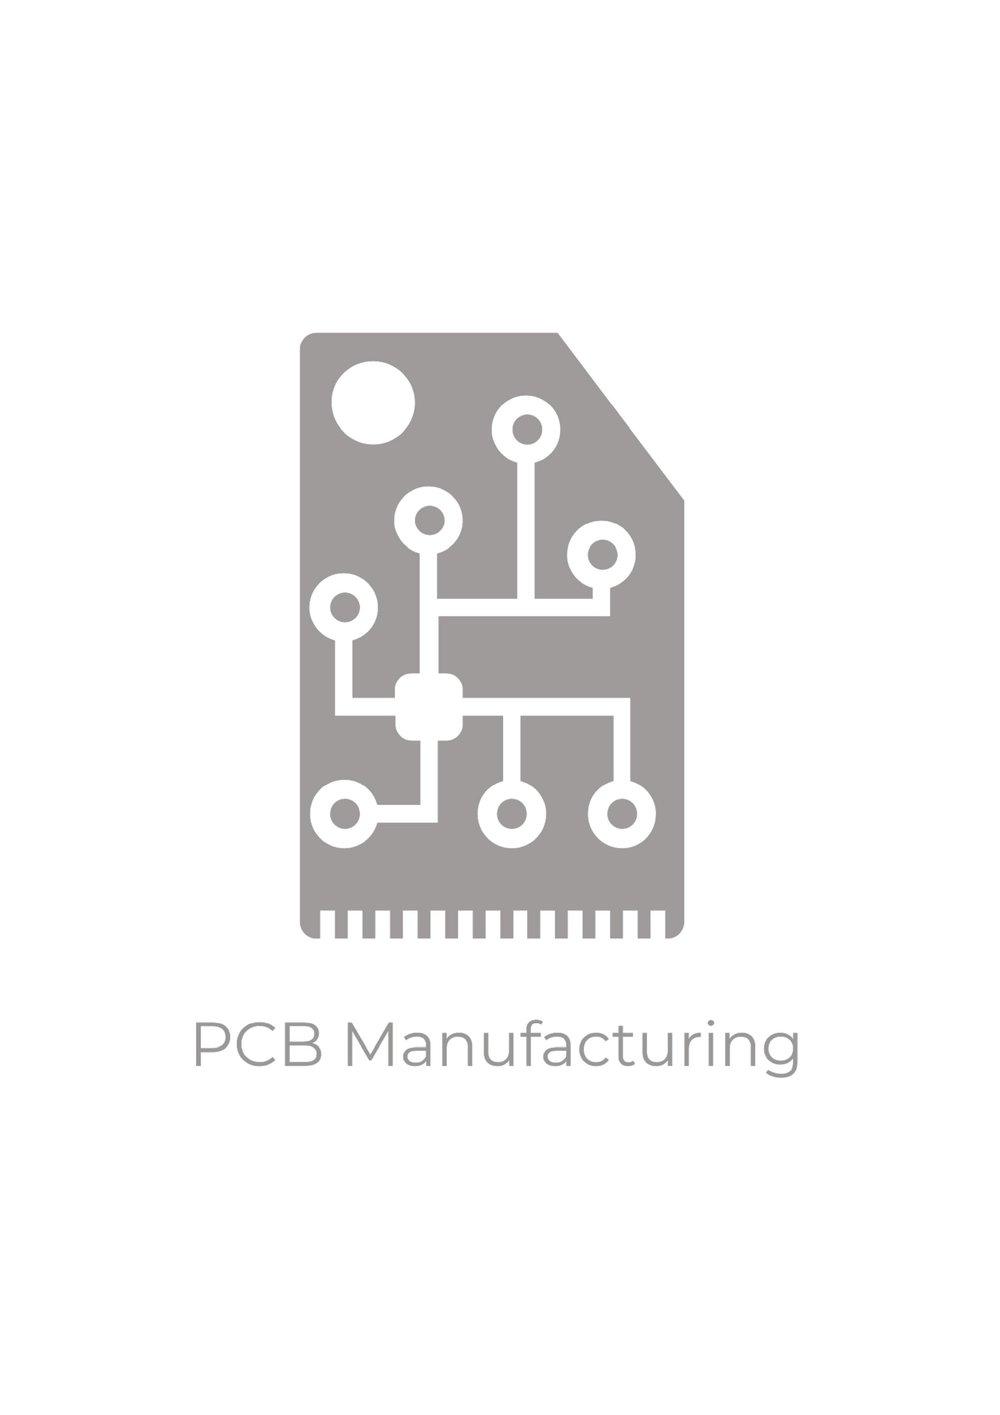 PCBManufacturing.jpg